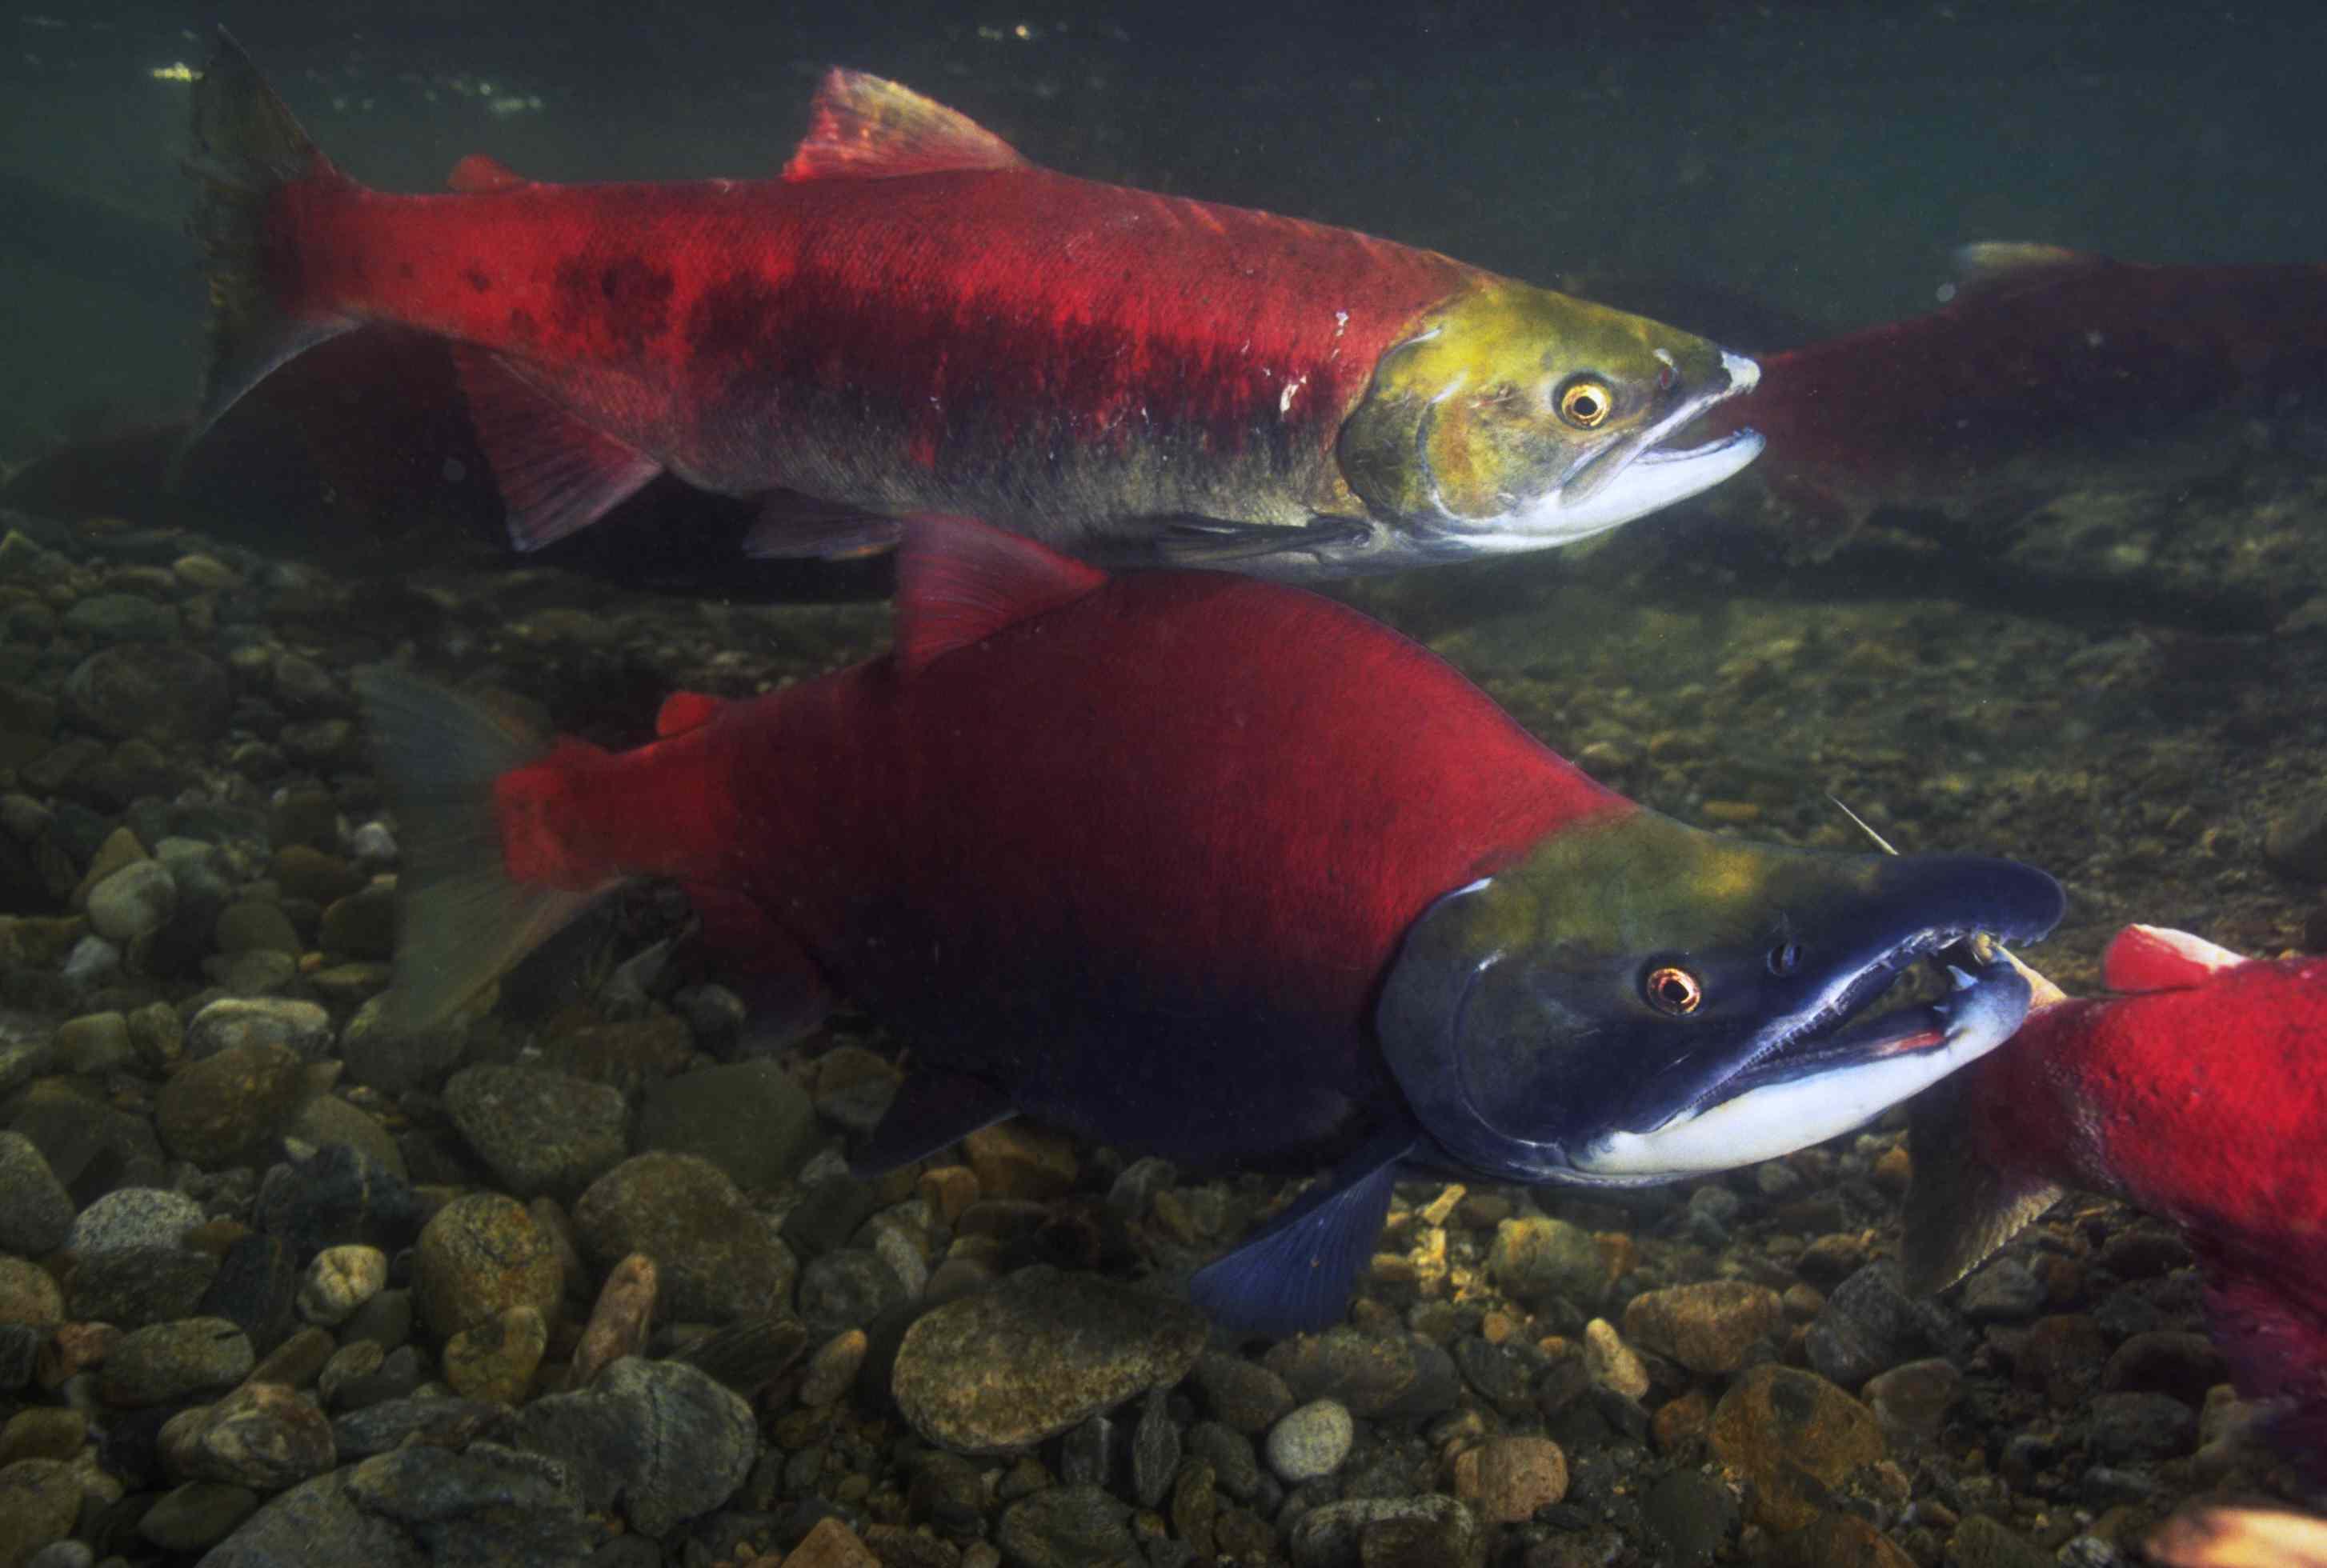 Spawning Sockeye Salmon on the Fraser River Run in North America